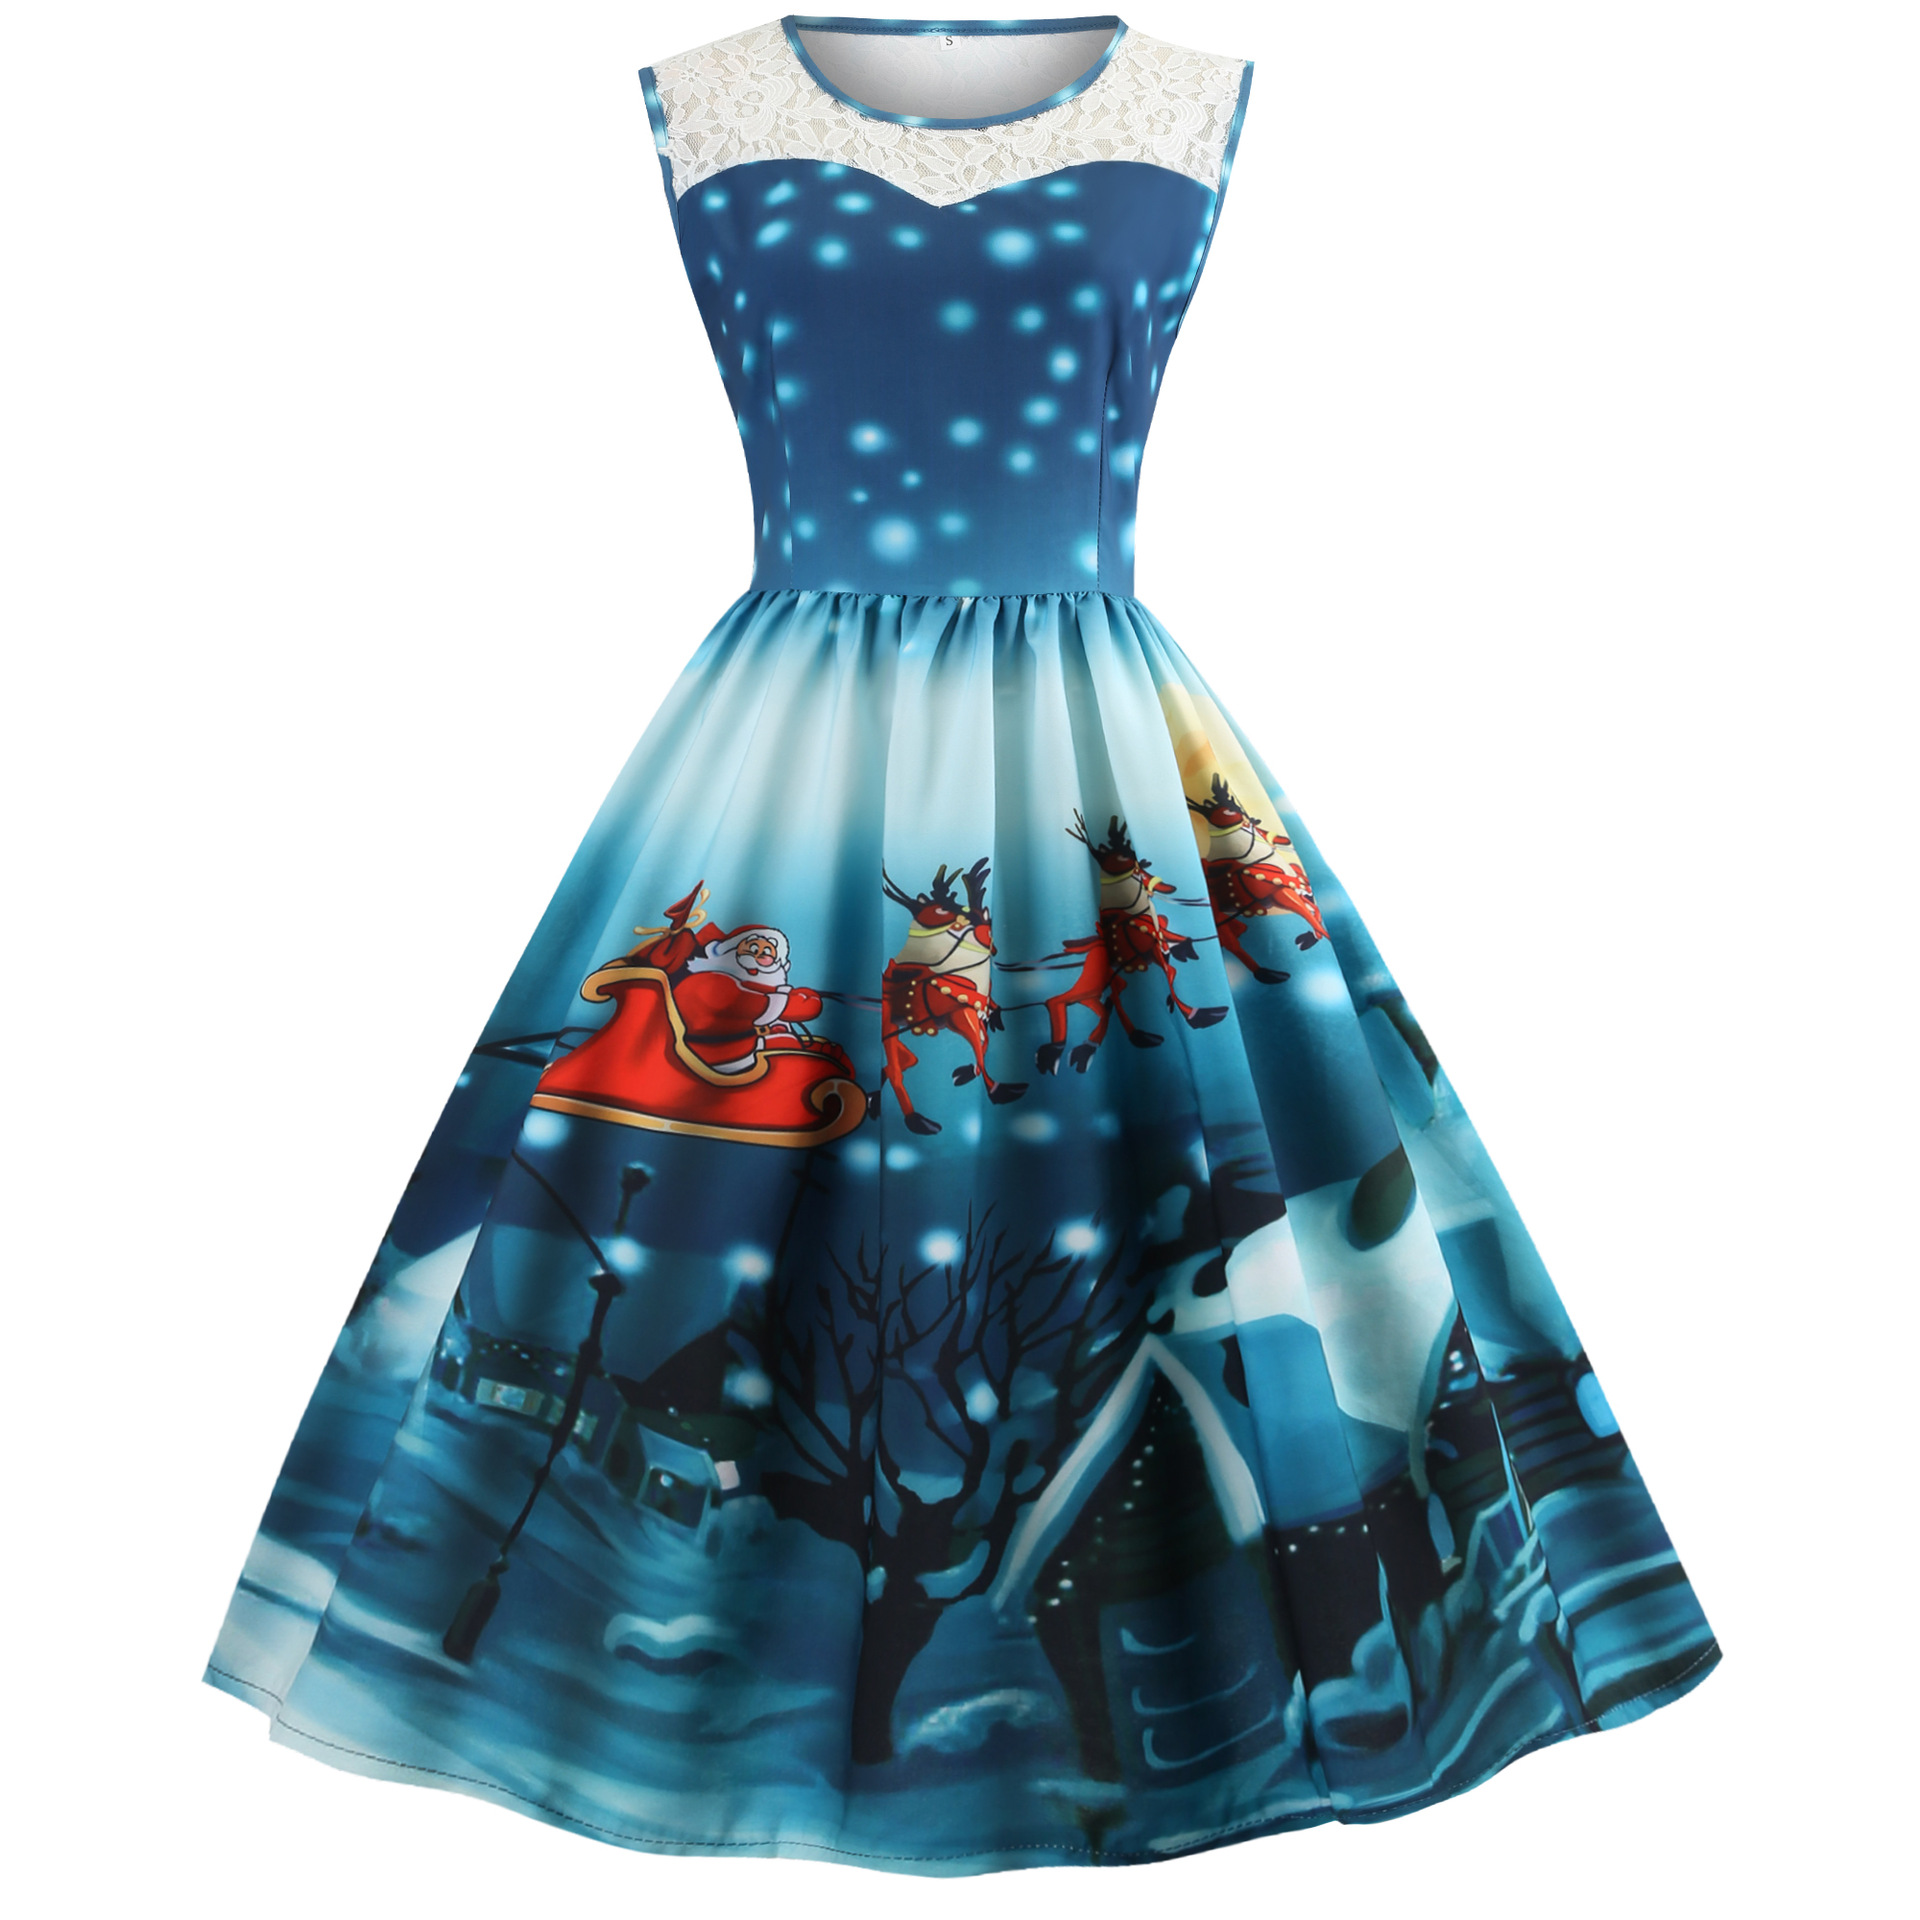 7c2f4491486 S~3XL Plus Size Christmas Dress Women Summer Dress 2018 Sleeveless Retro  Dress Vintage Tunic